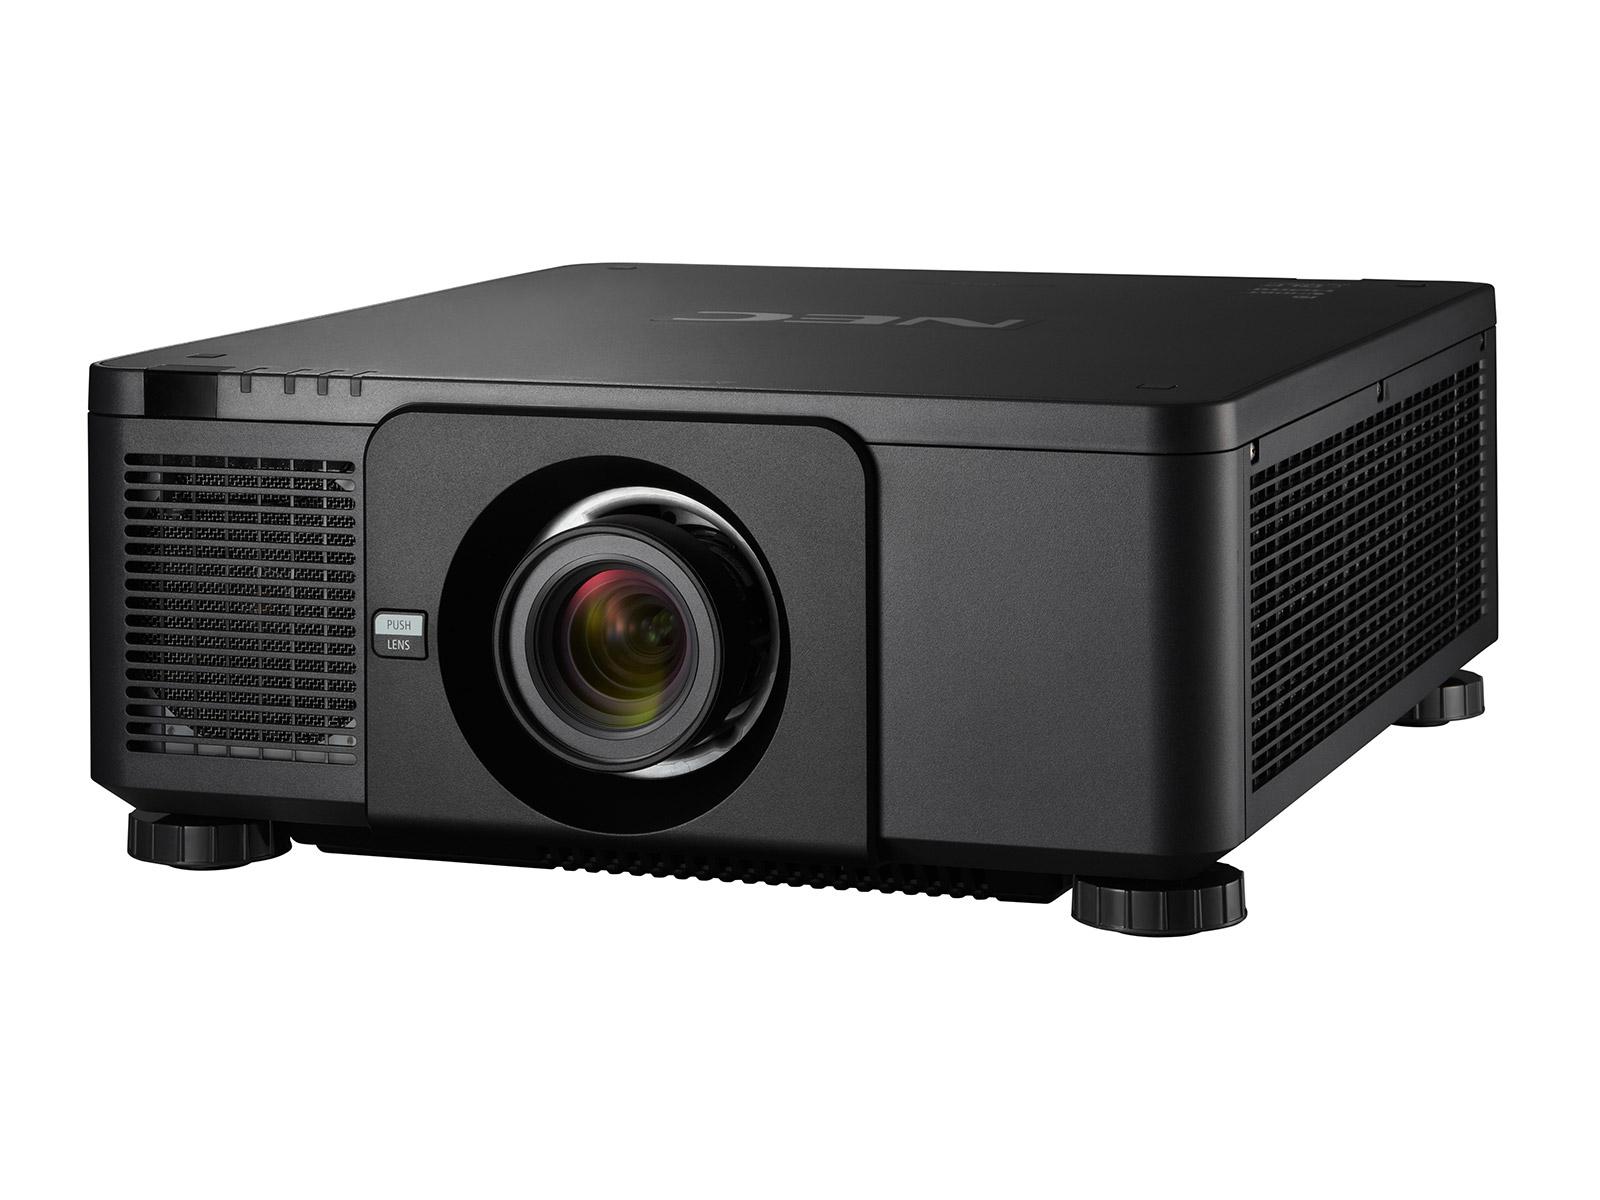 NEC PX803UL 8000ANSI lumens DLP WUXGA (1920x1200) 3D Desktop Black